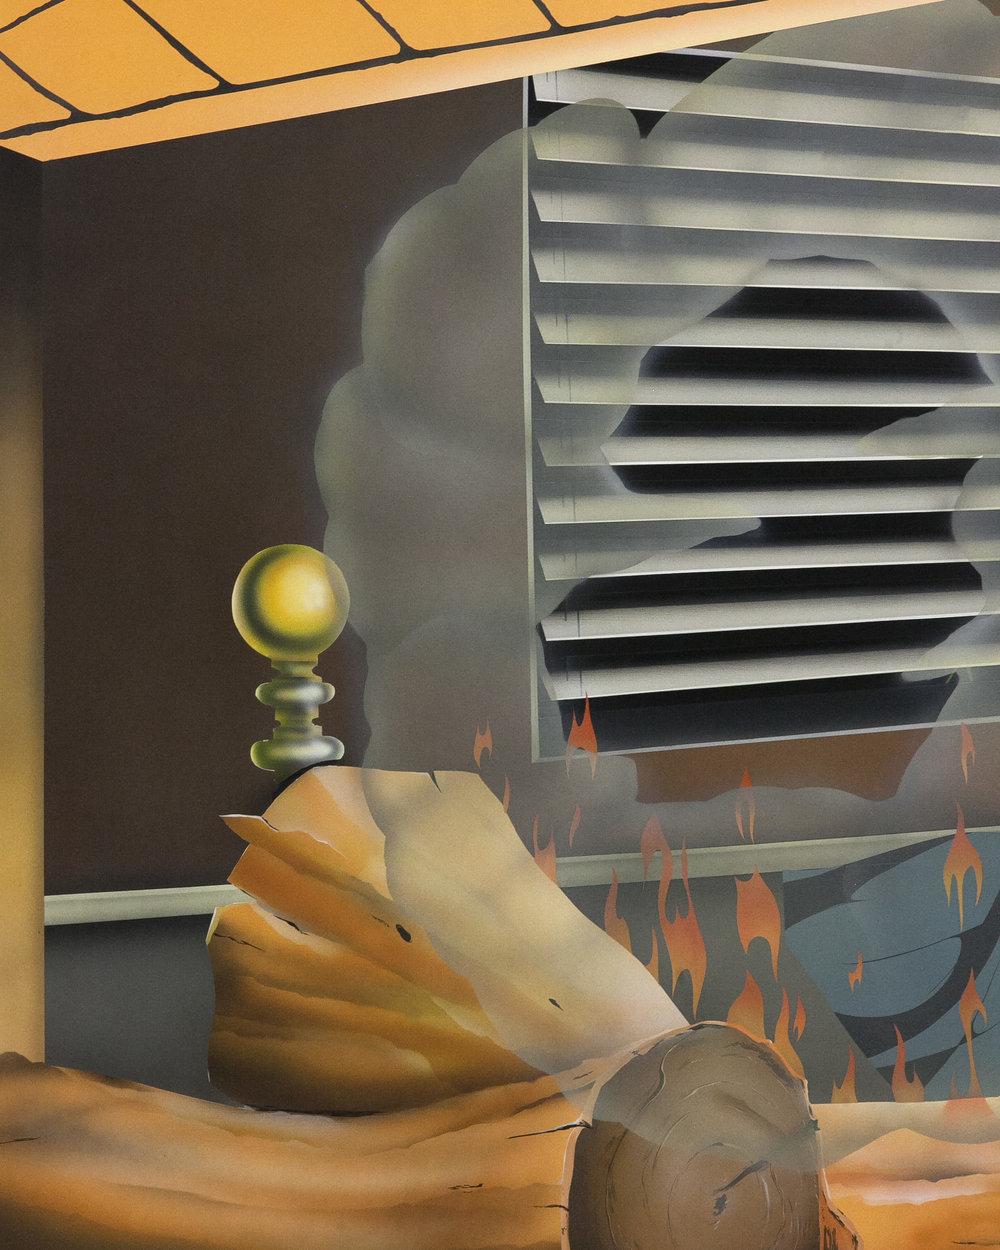 aej_lrg_fireplace_canvas_3.jpg